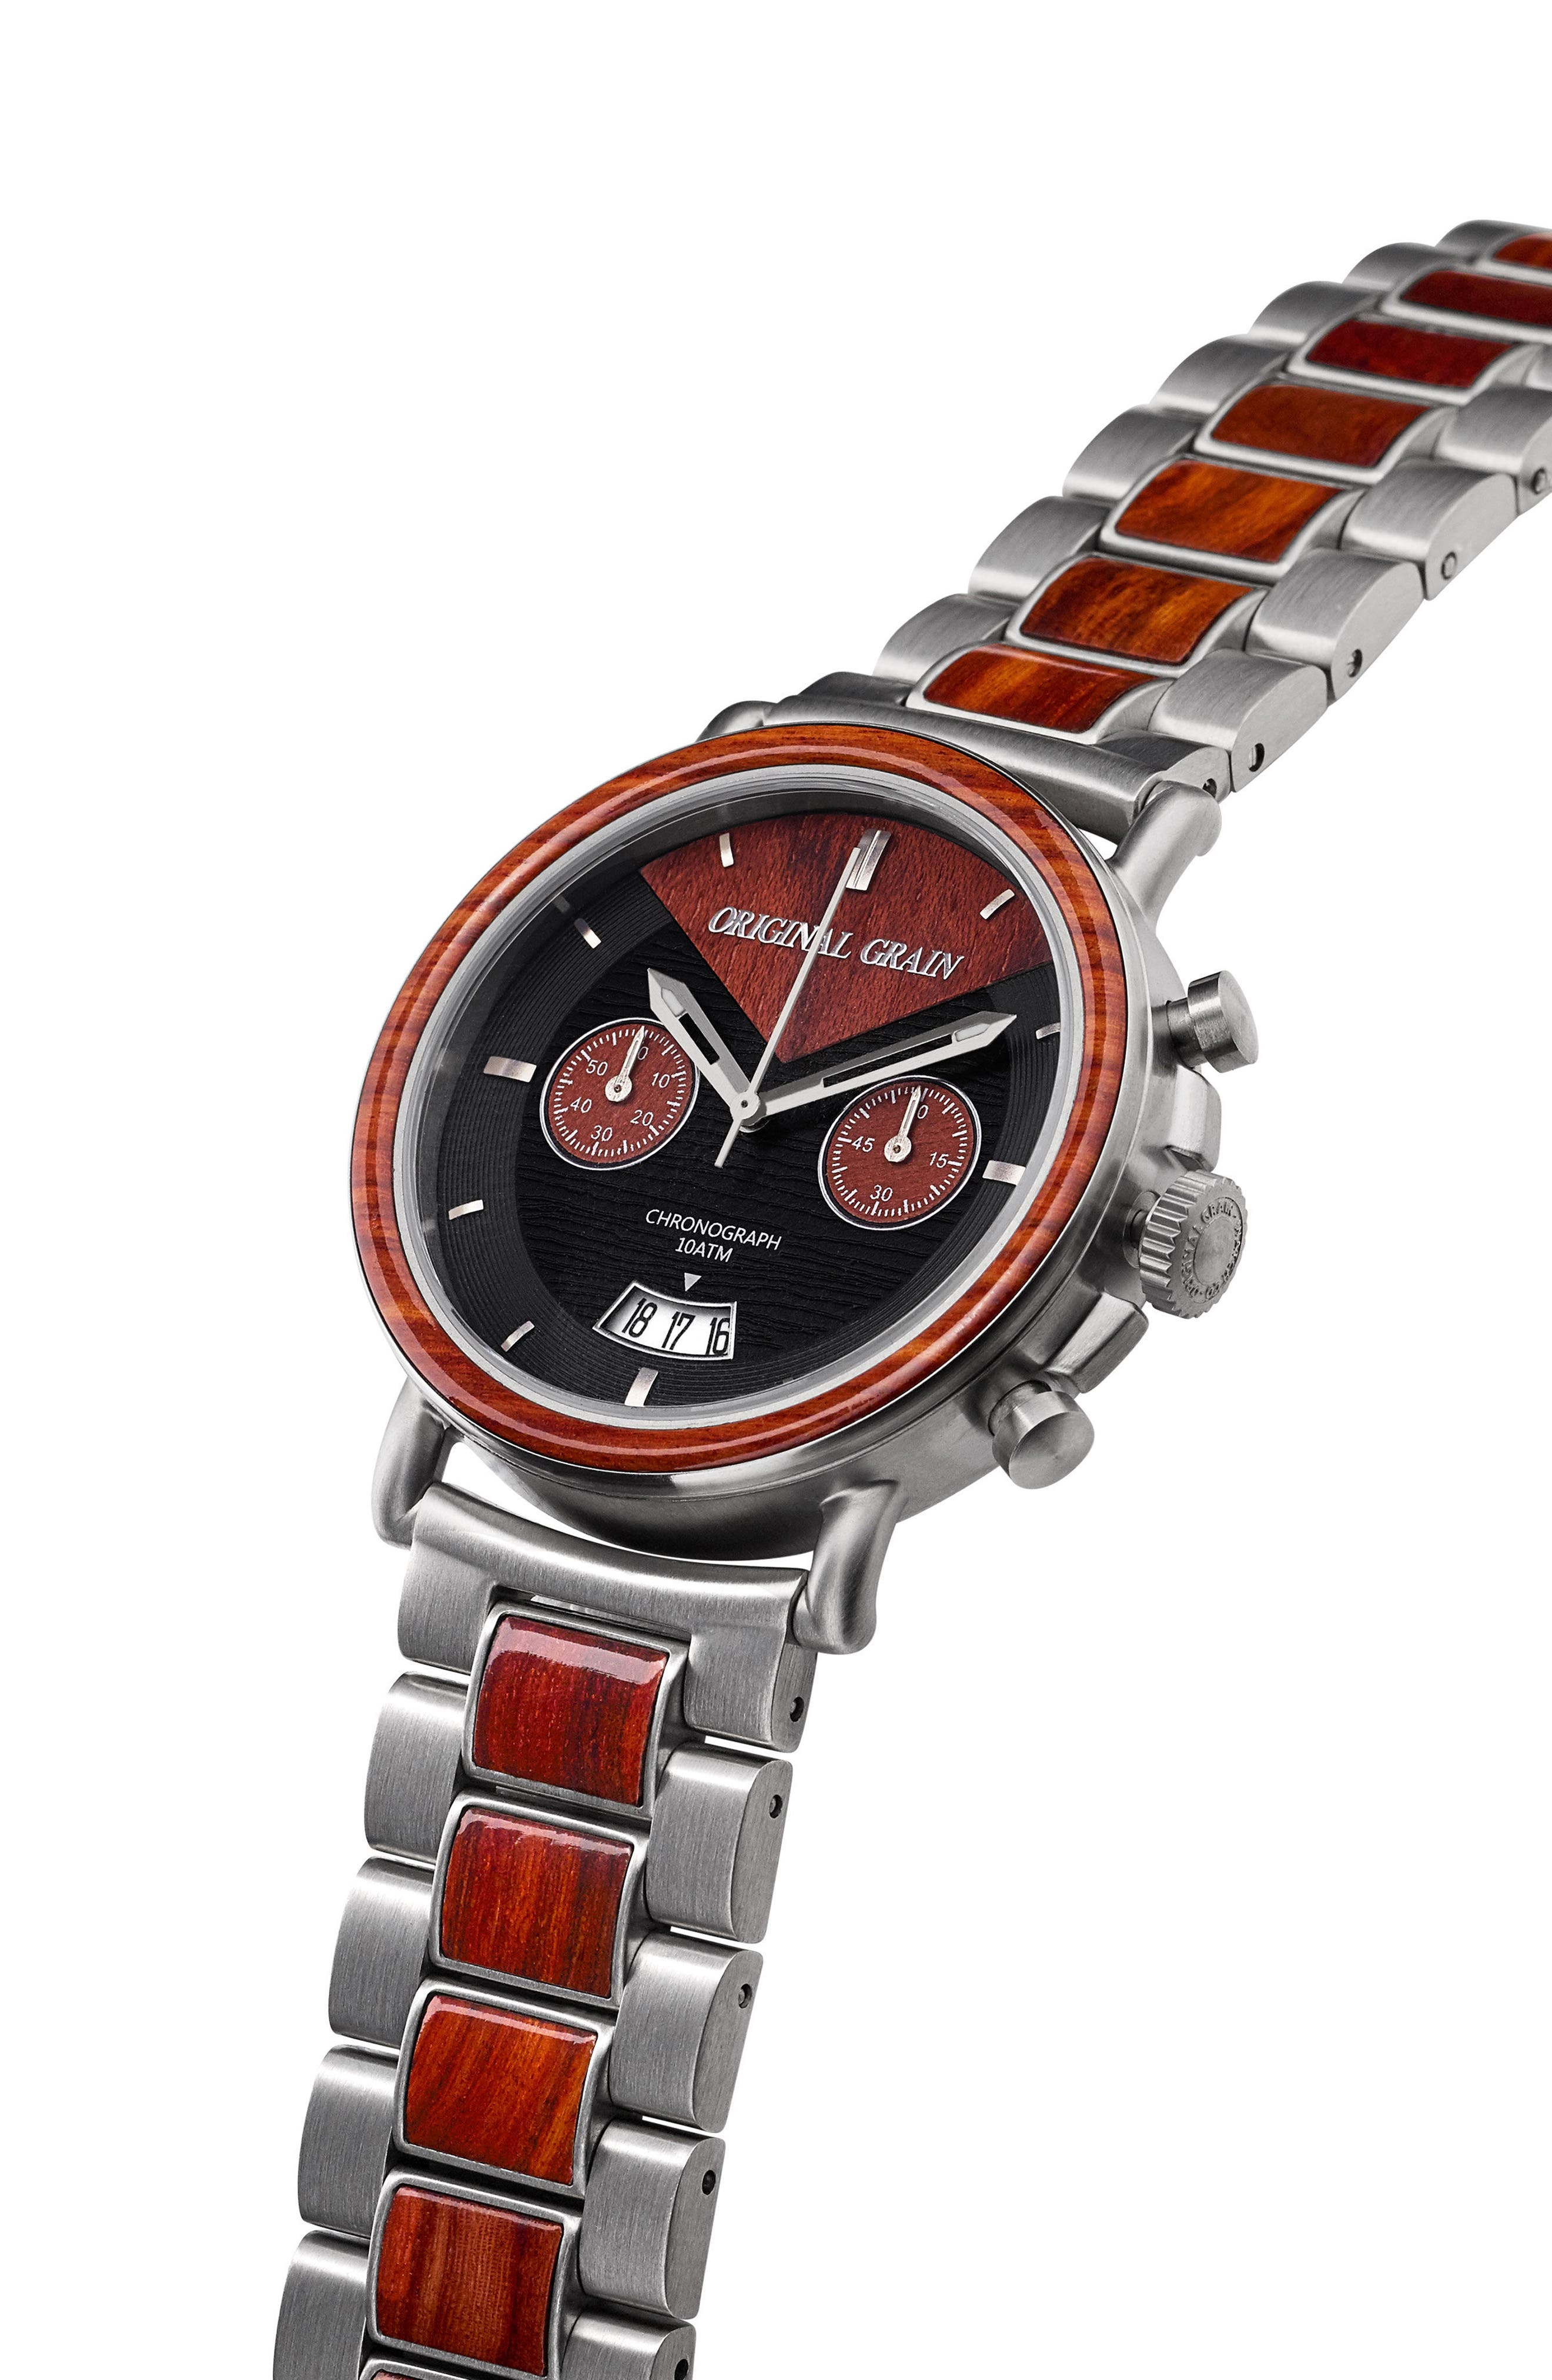 Alternate Image 3  - Original Grain Alterra Chronograph Bracelet Watch